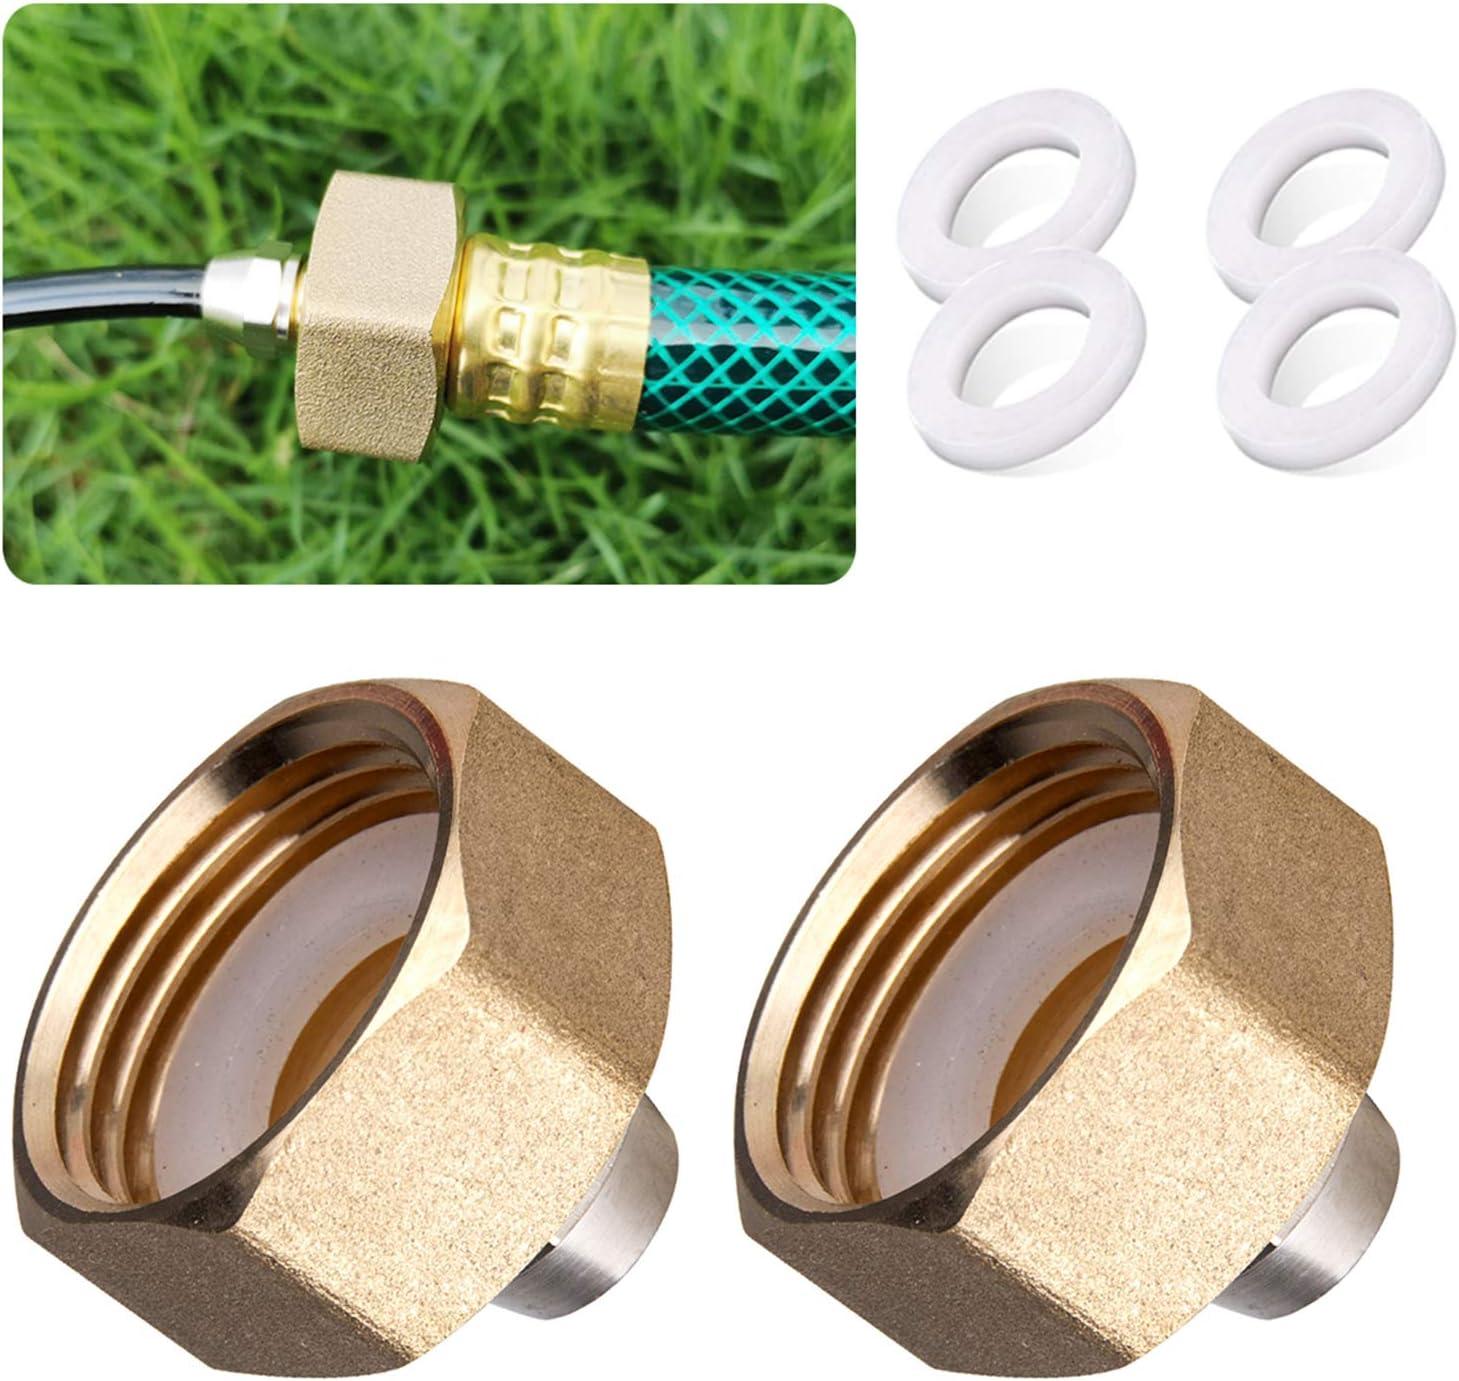 HOMENOTE US Standard Faucet Adapter, 3/4'' to 1/4'' Hose Adapter, Convert 3/4